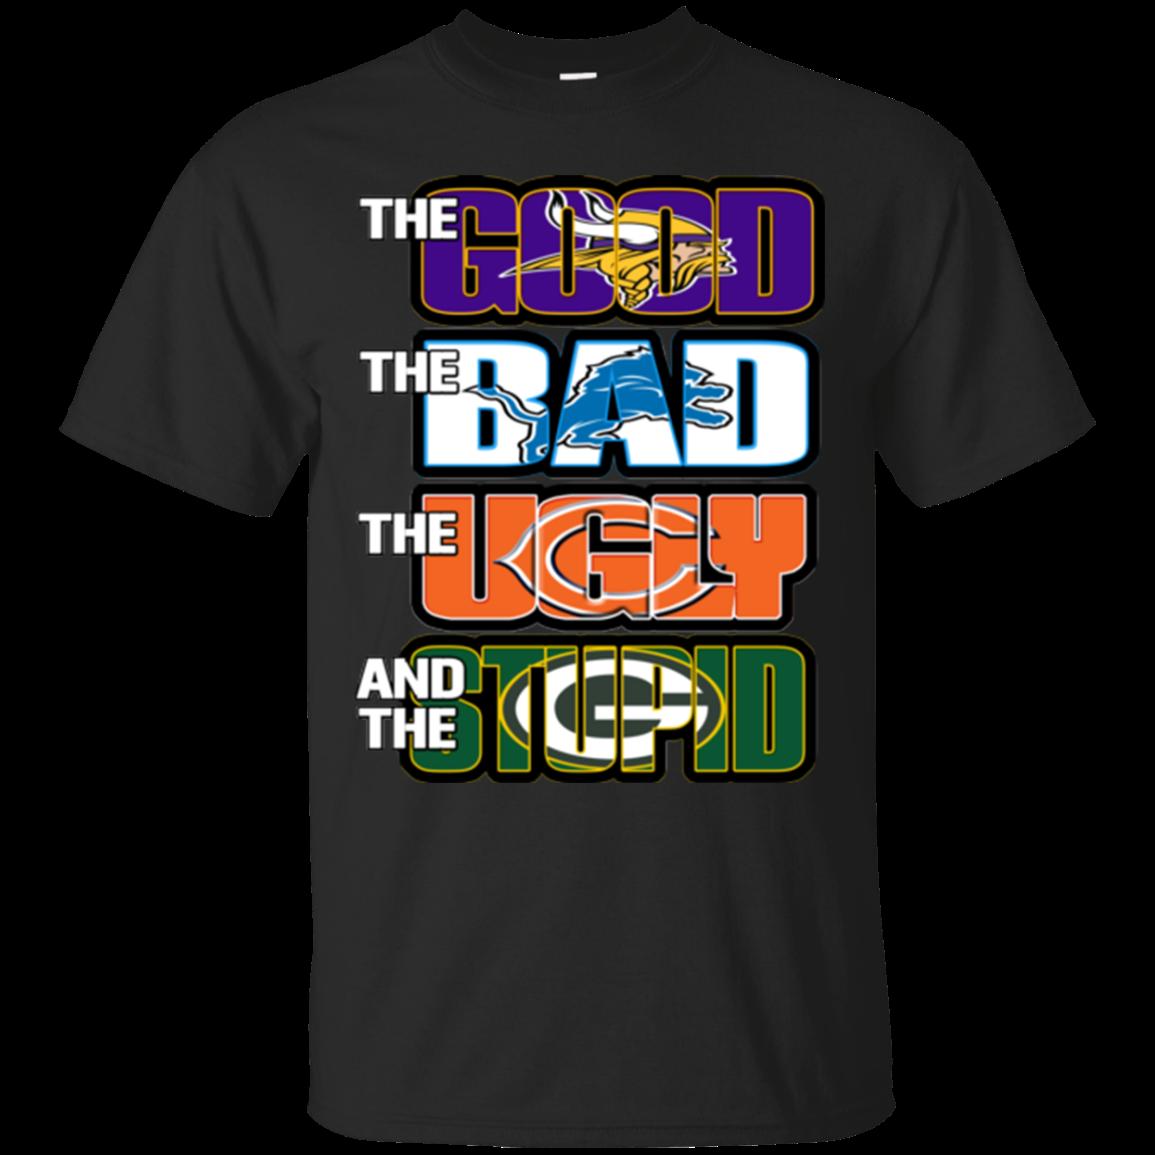 Minnesota Vikings Shirts The Good The Bad The Ugly The Stupid T shirts  Hoodies Sweatshirts b0227298b